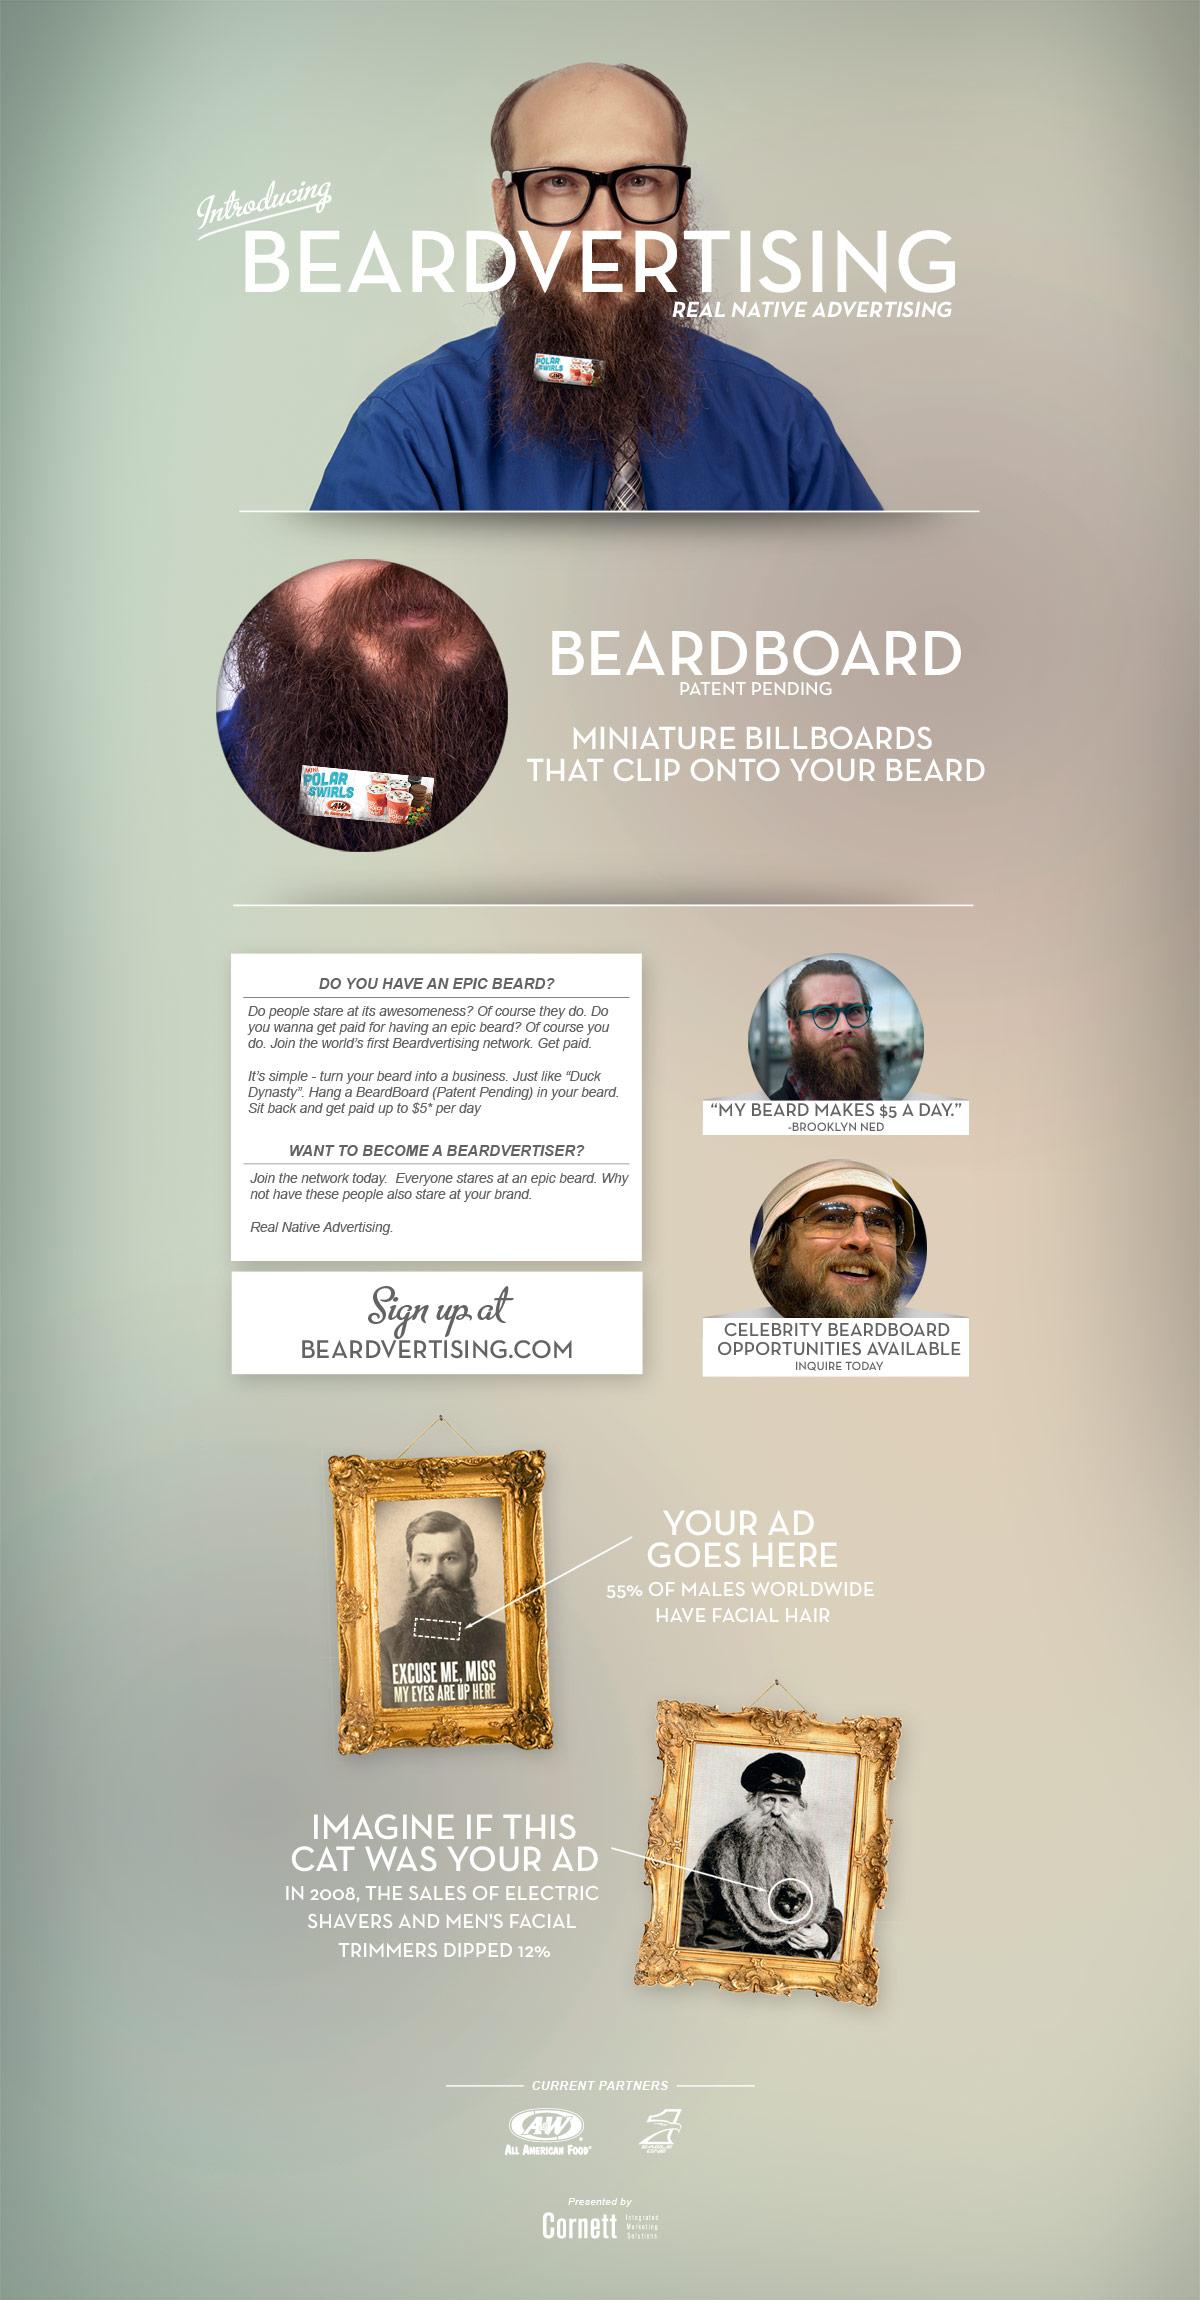 beardvertising-1-sheet.jpg